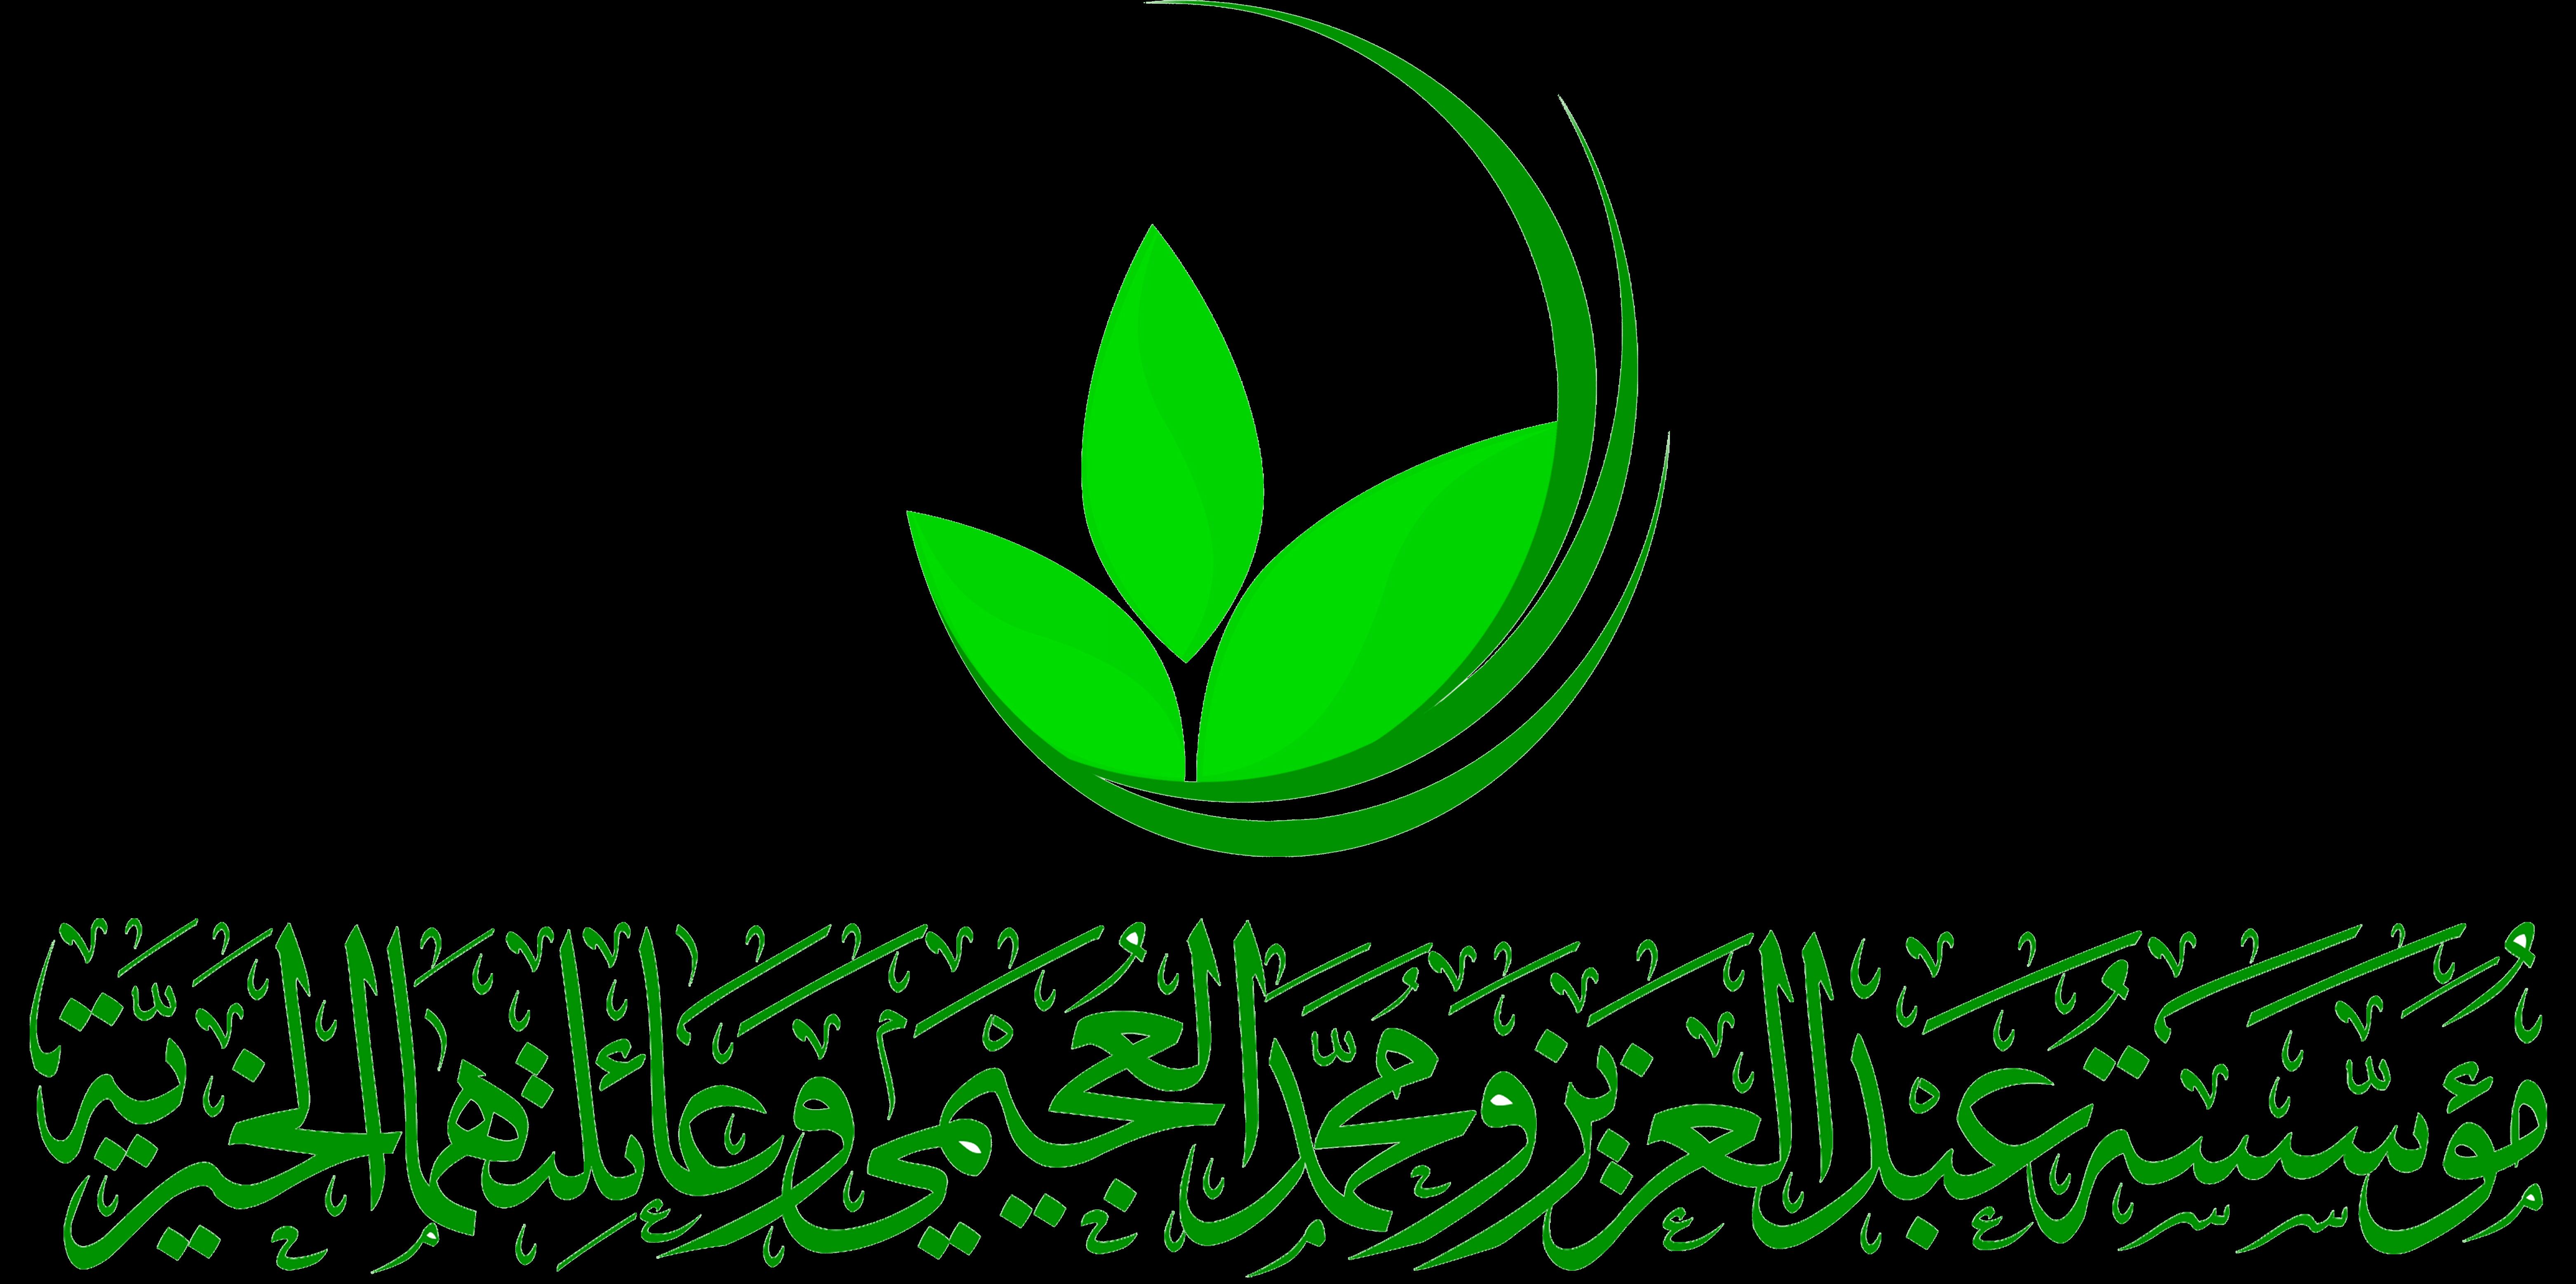 cropped-شعار-مؤسسة-العجيمي-الخيرية13-3.png